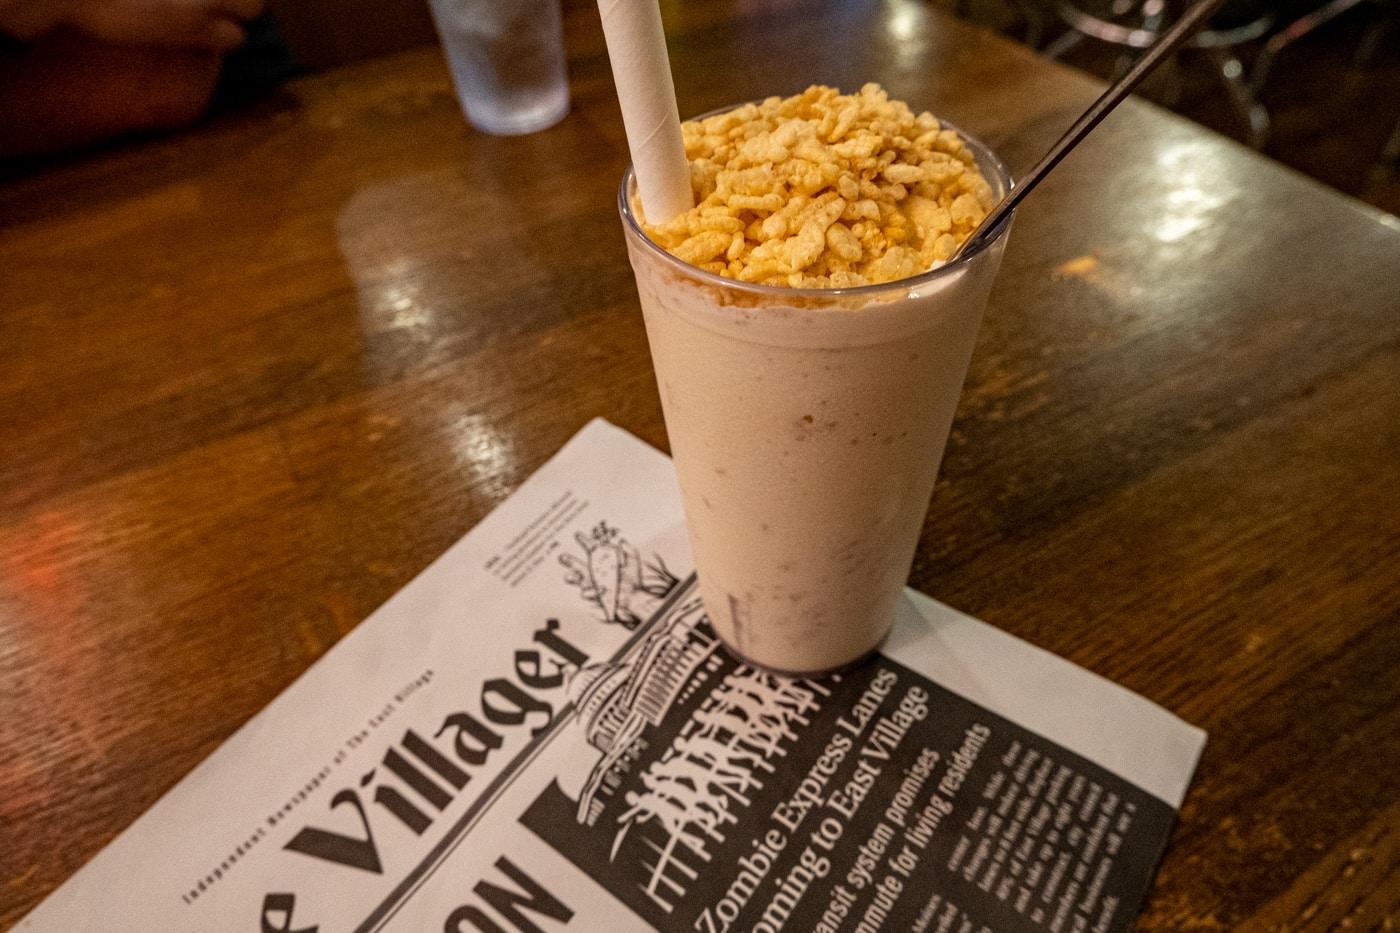 Rice Krispie Treat Milkshake at Zombie Burger in Des Moines, Iowa.